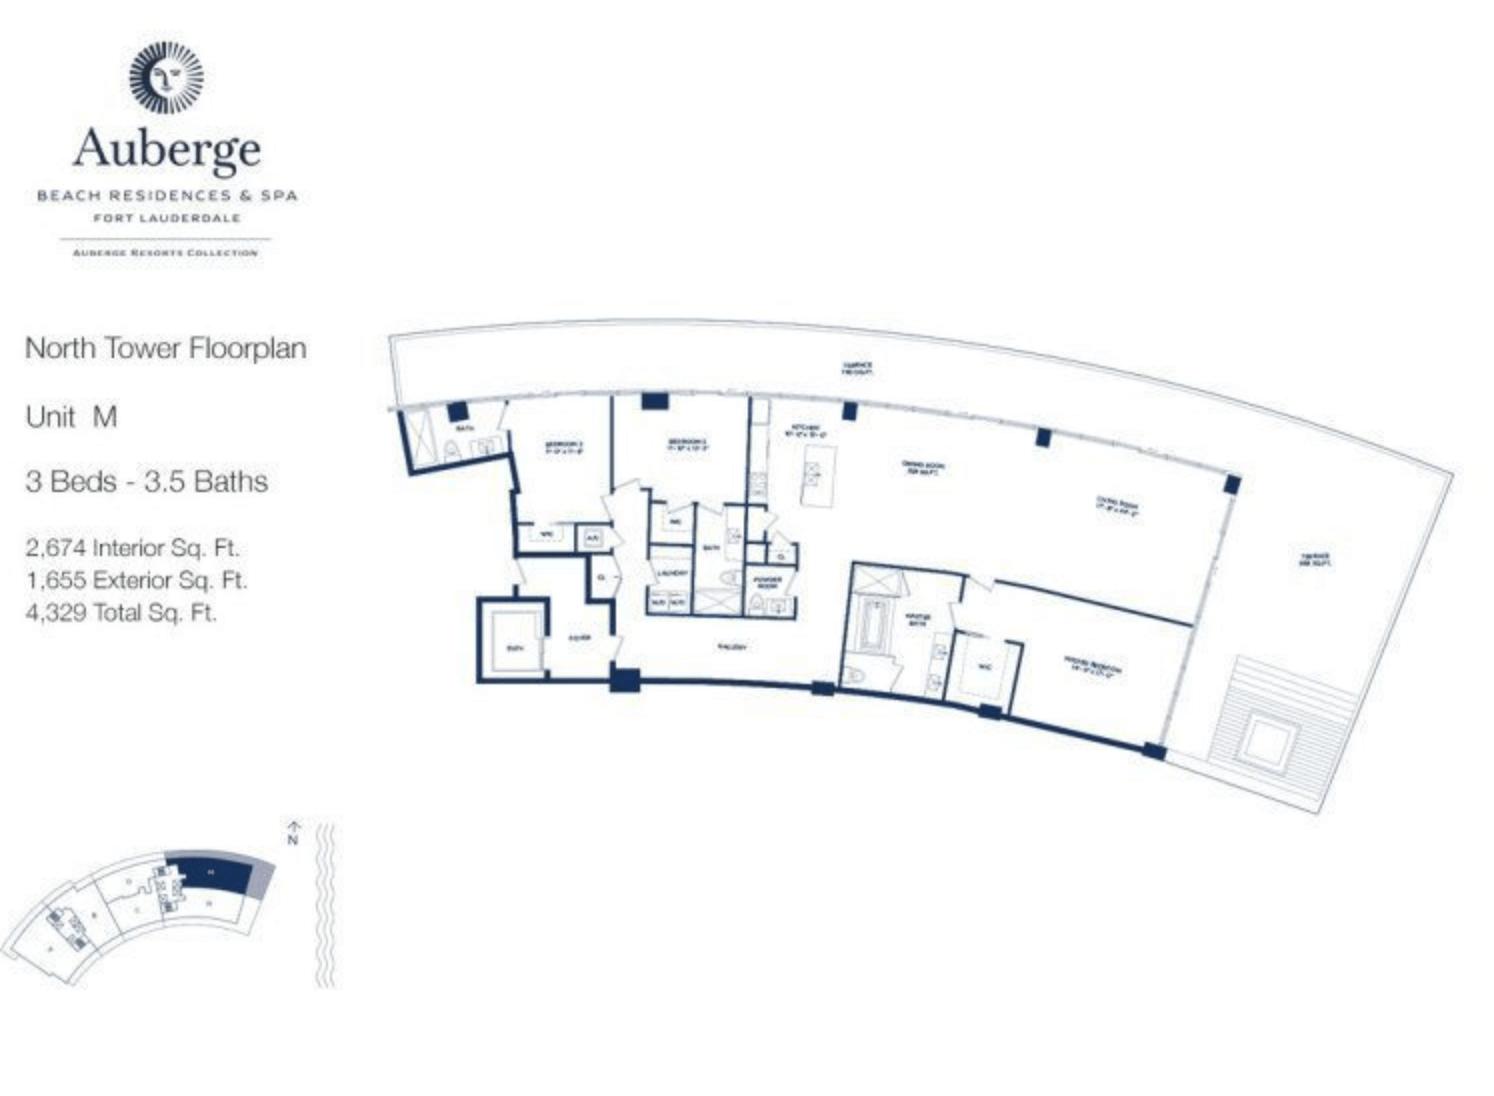 Auberge Beach Residences North Tower M | 3 Beds - 3.5 baths